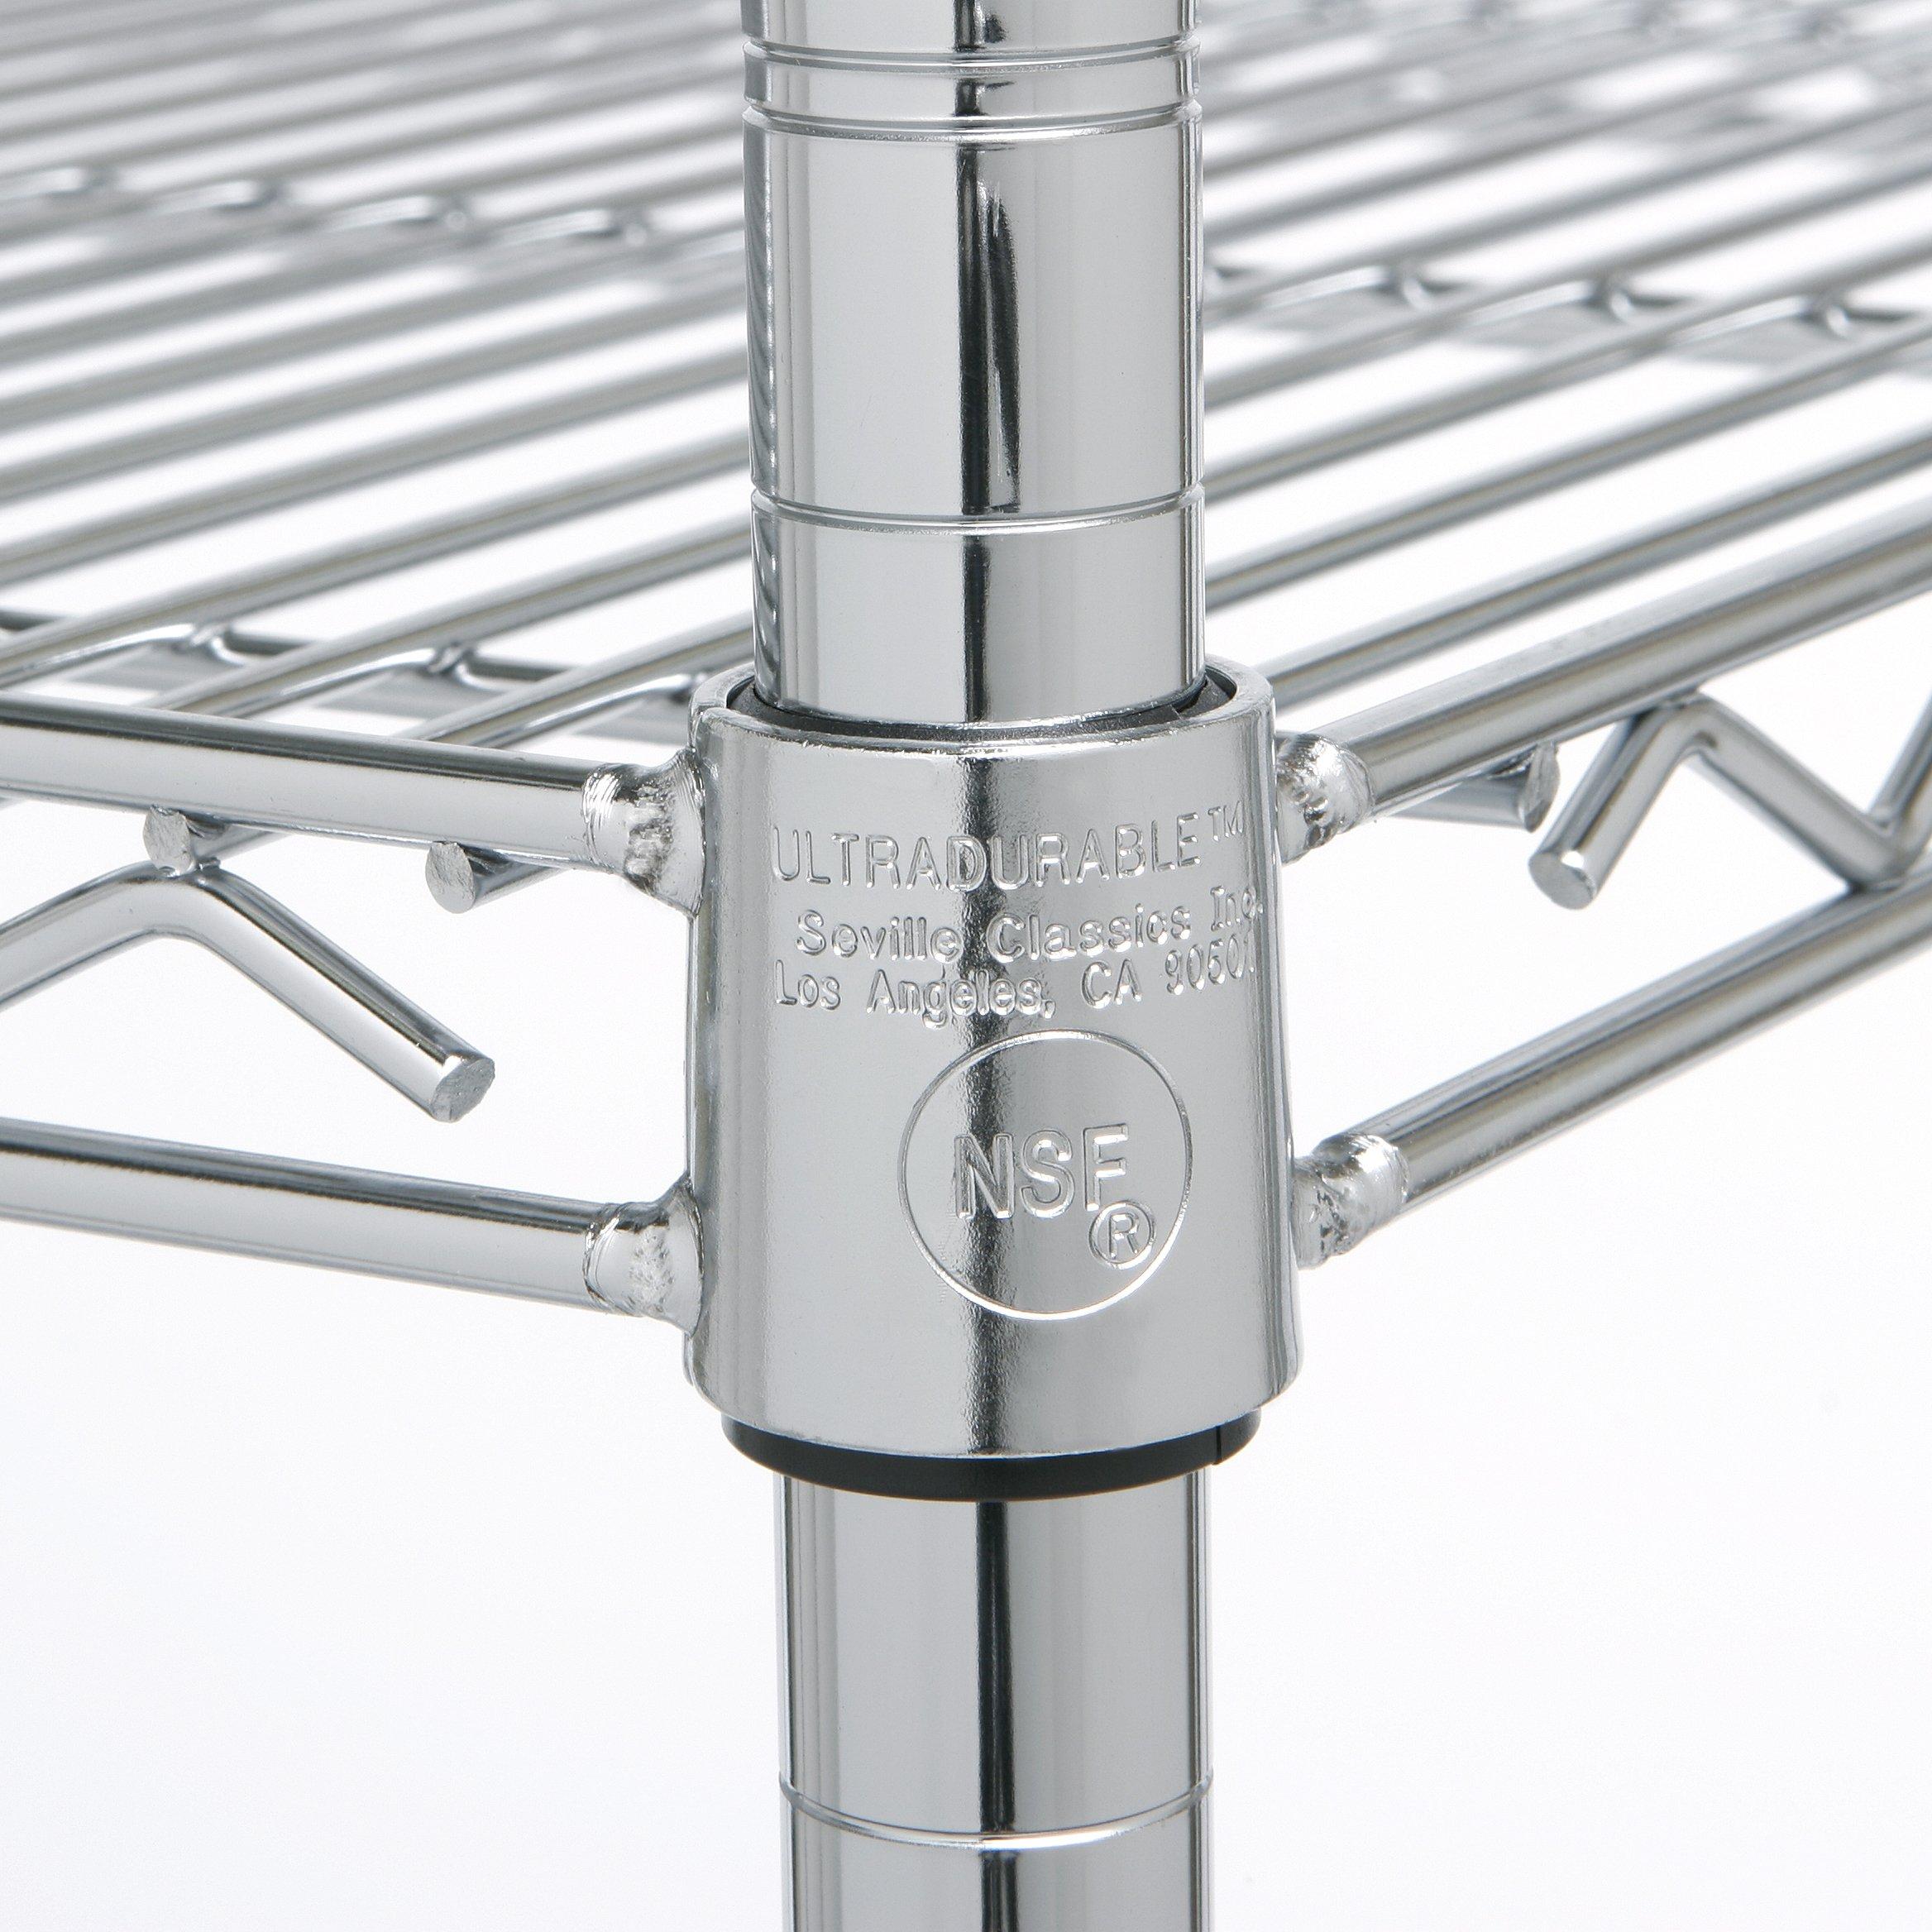 Seville Classics 4-Tier UltraZinc NSF Steel Wire Shelving, 18'' D x 36'' W x 72'' H